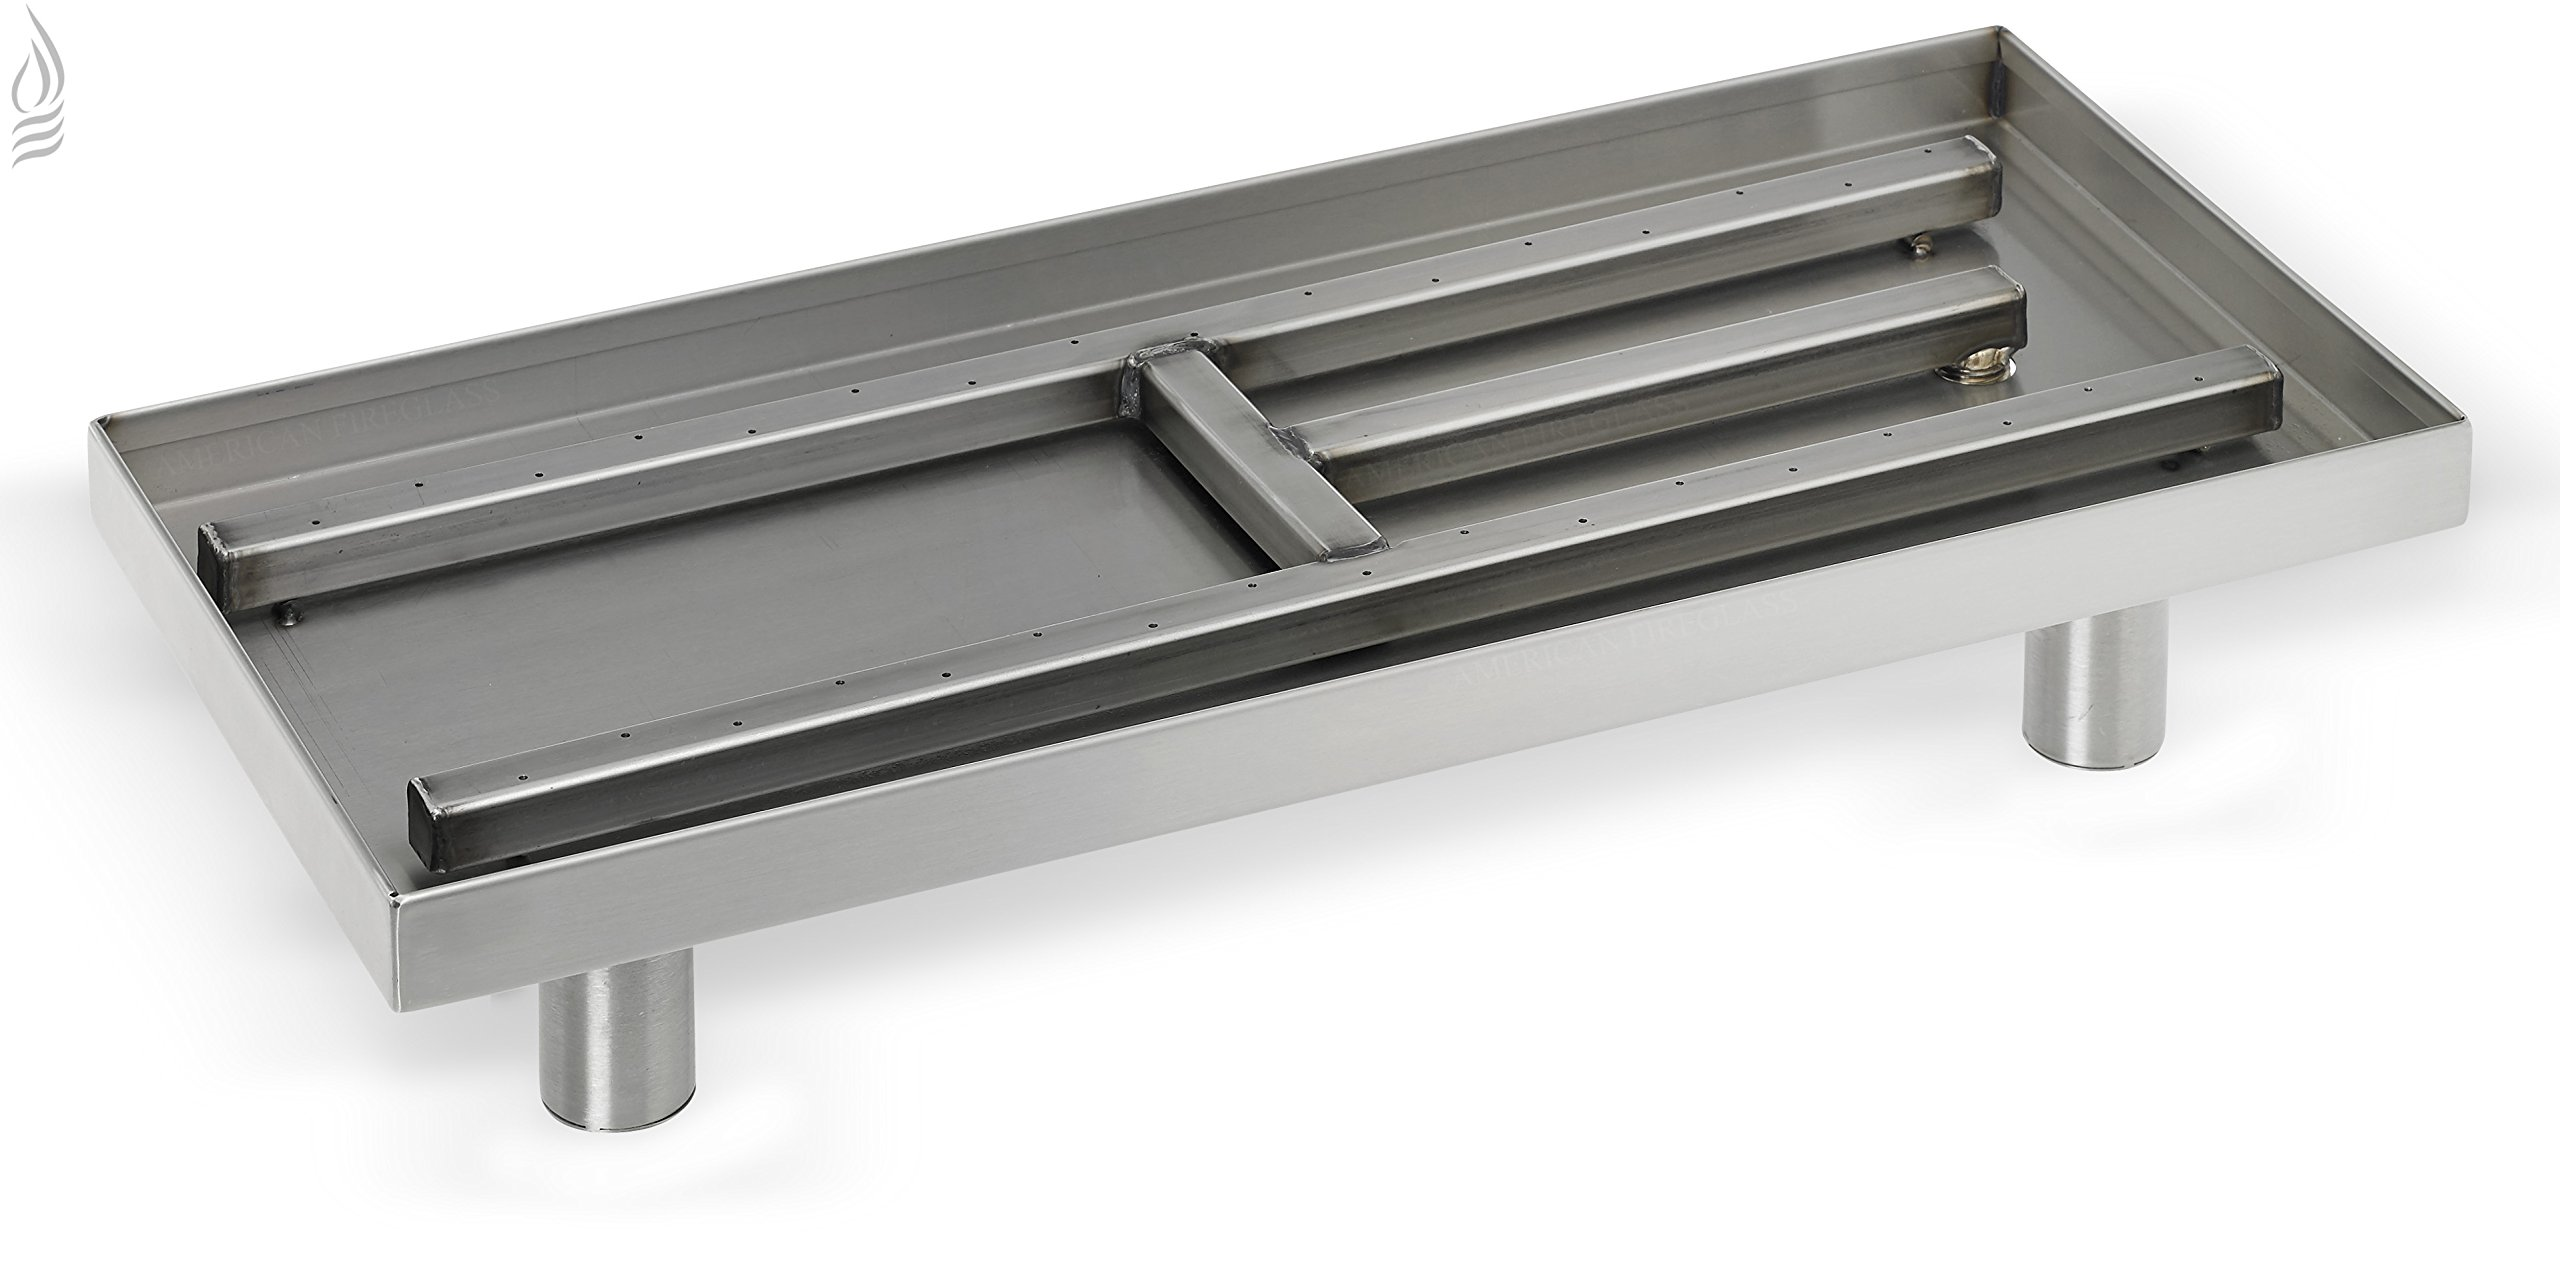 American Fireglass Rectangular Indoor/Outdoor Stainless Steel Fireplace Pan Burner (SS-R-22), 22-Inch